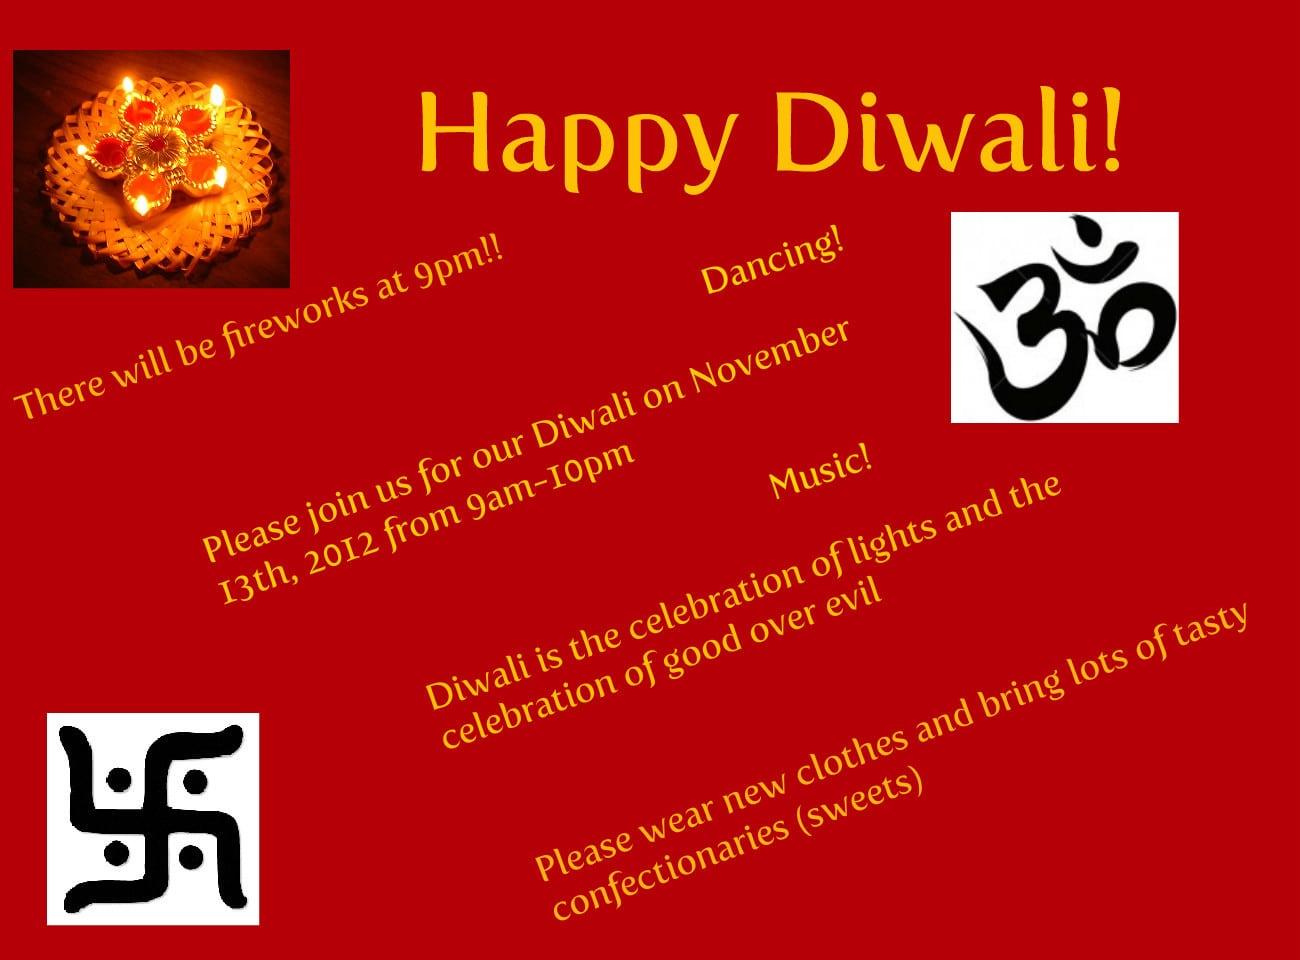 Diwali Celebration Invitation Card With Diwali Greeting Text And